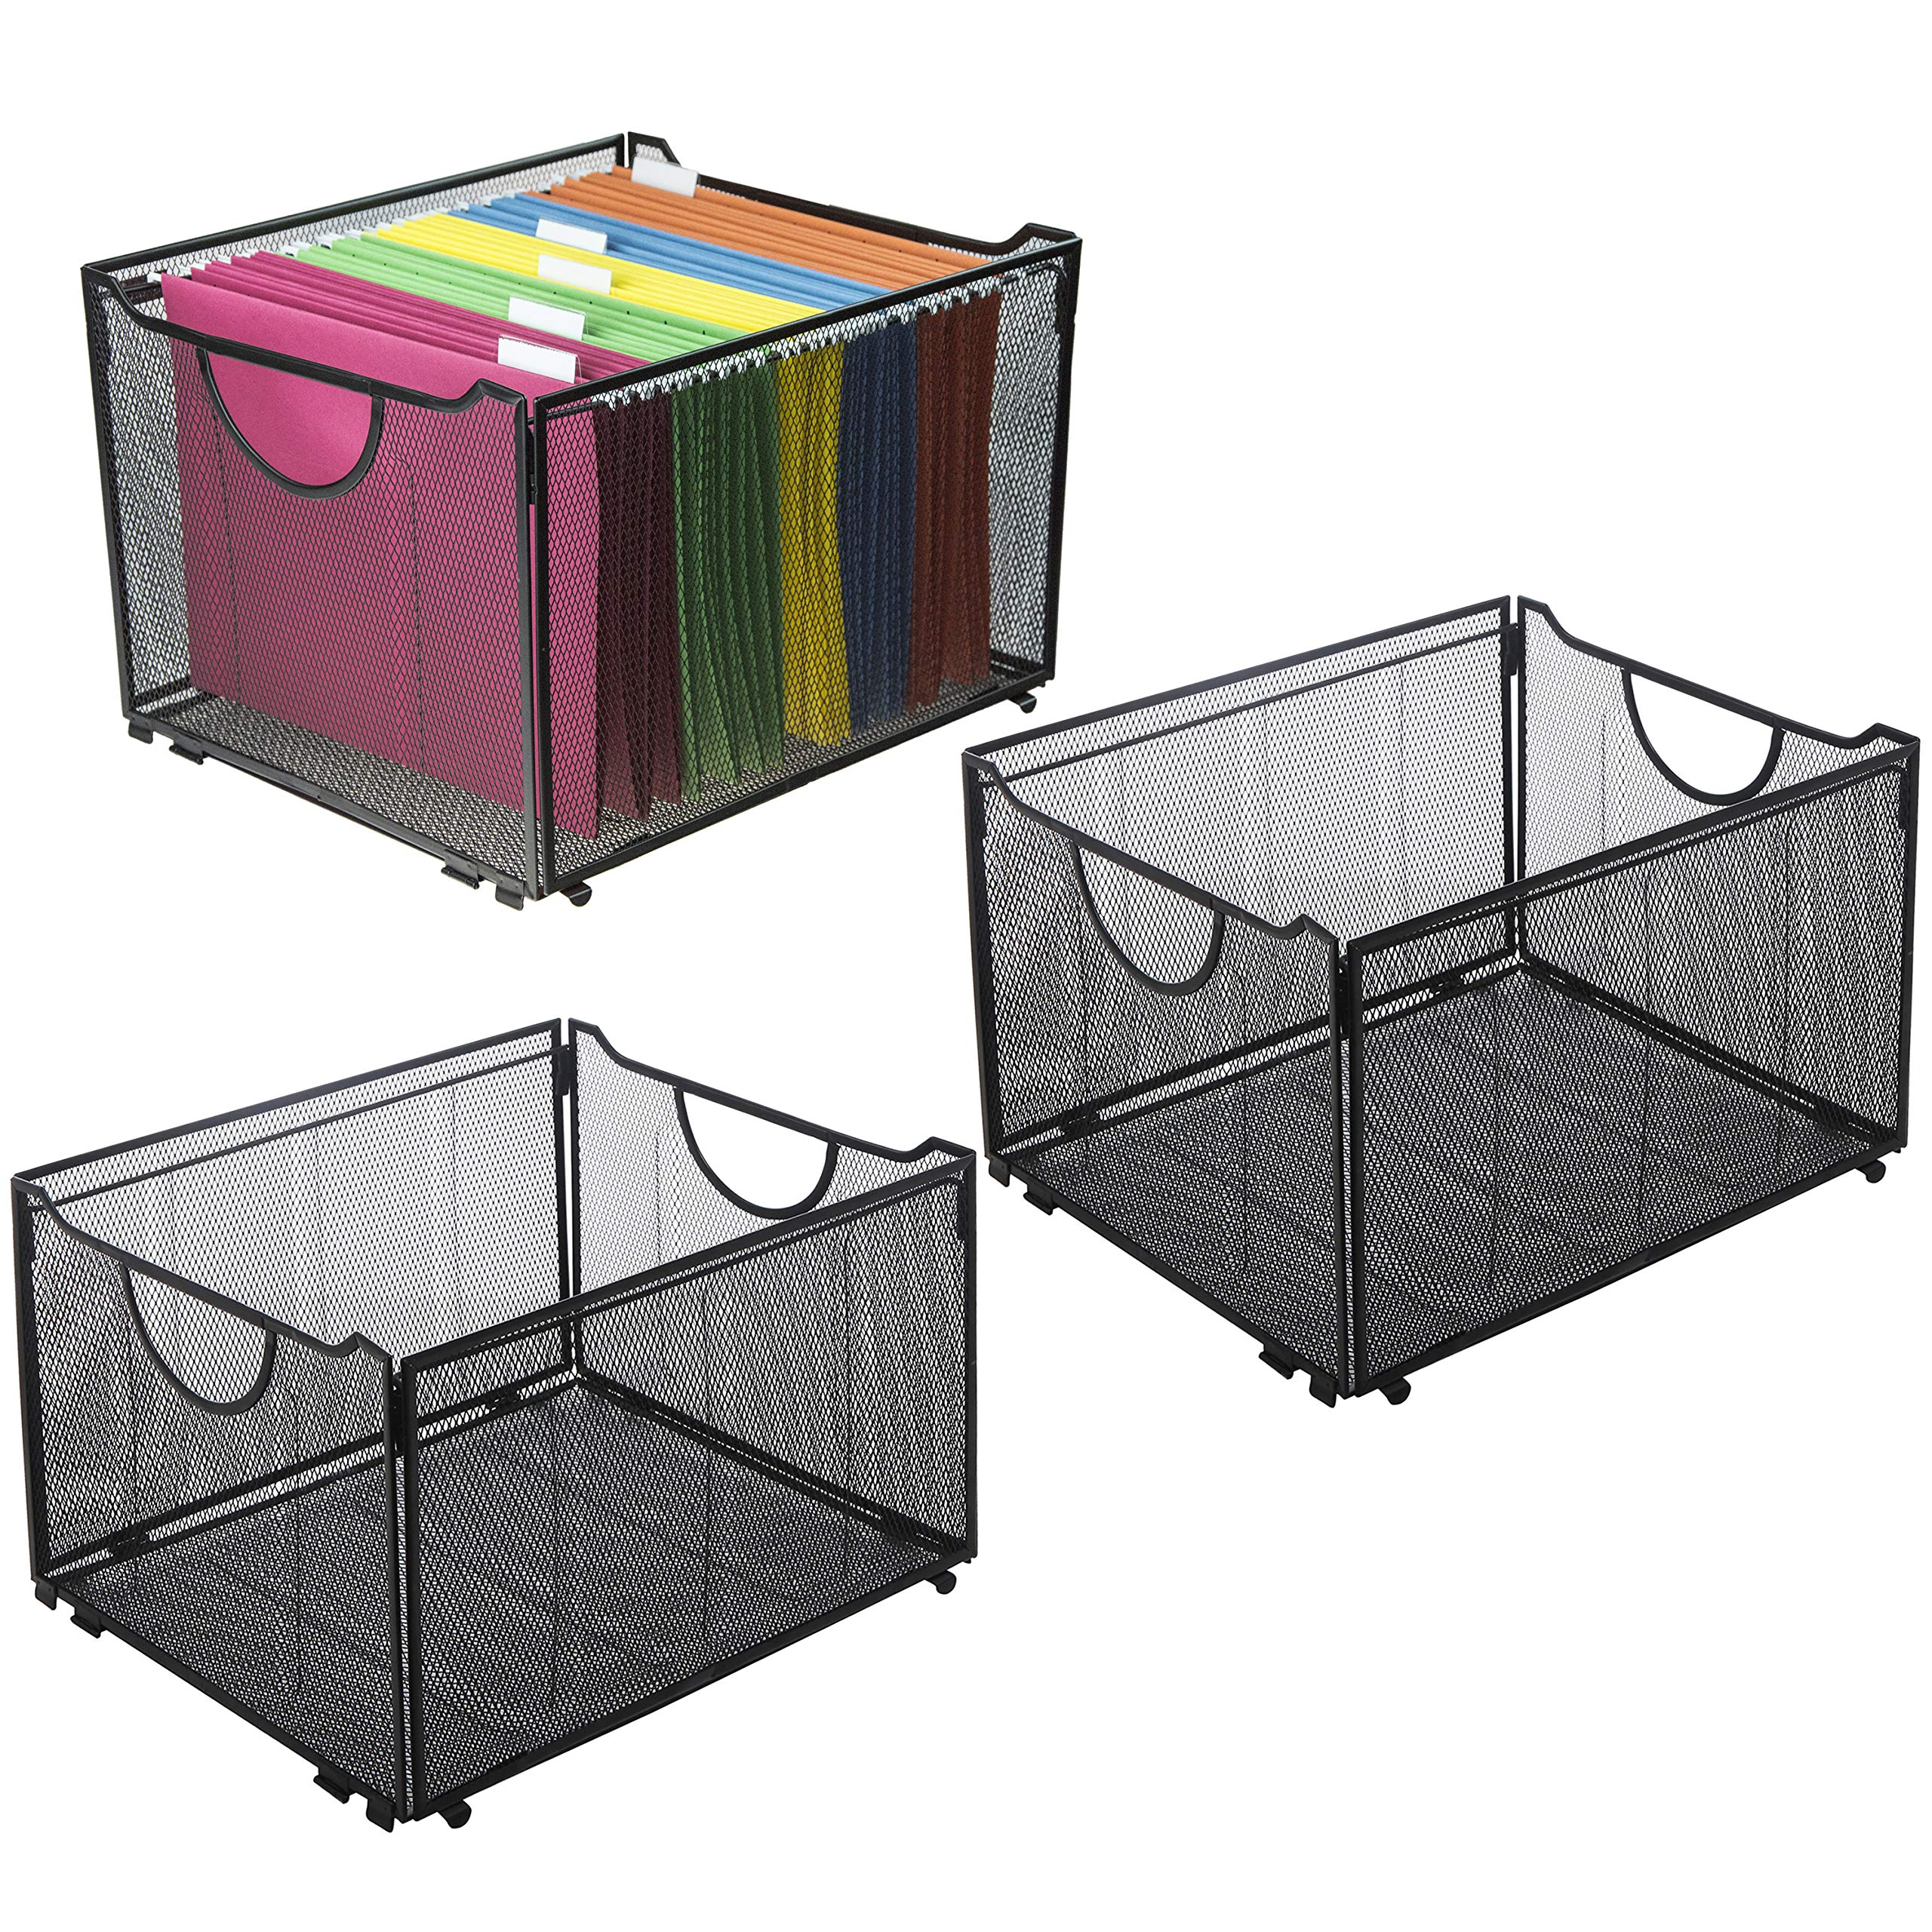 Set of 3 Black Metal Mesh Collapsible File Folder Boxes, Office Storage Crate